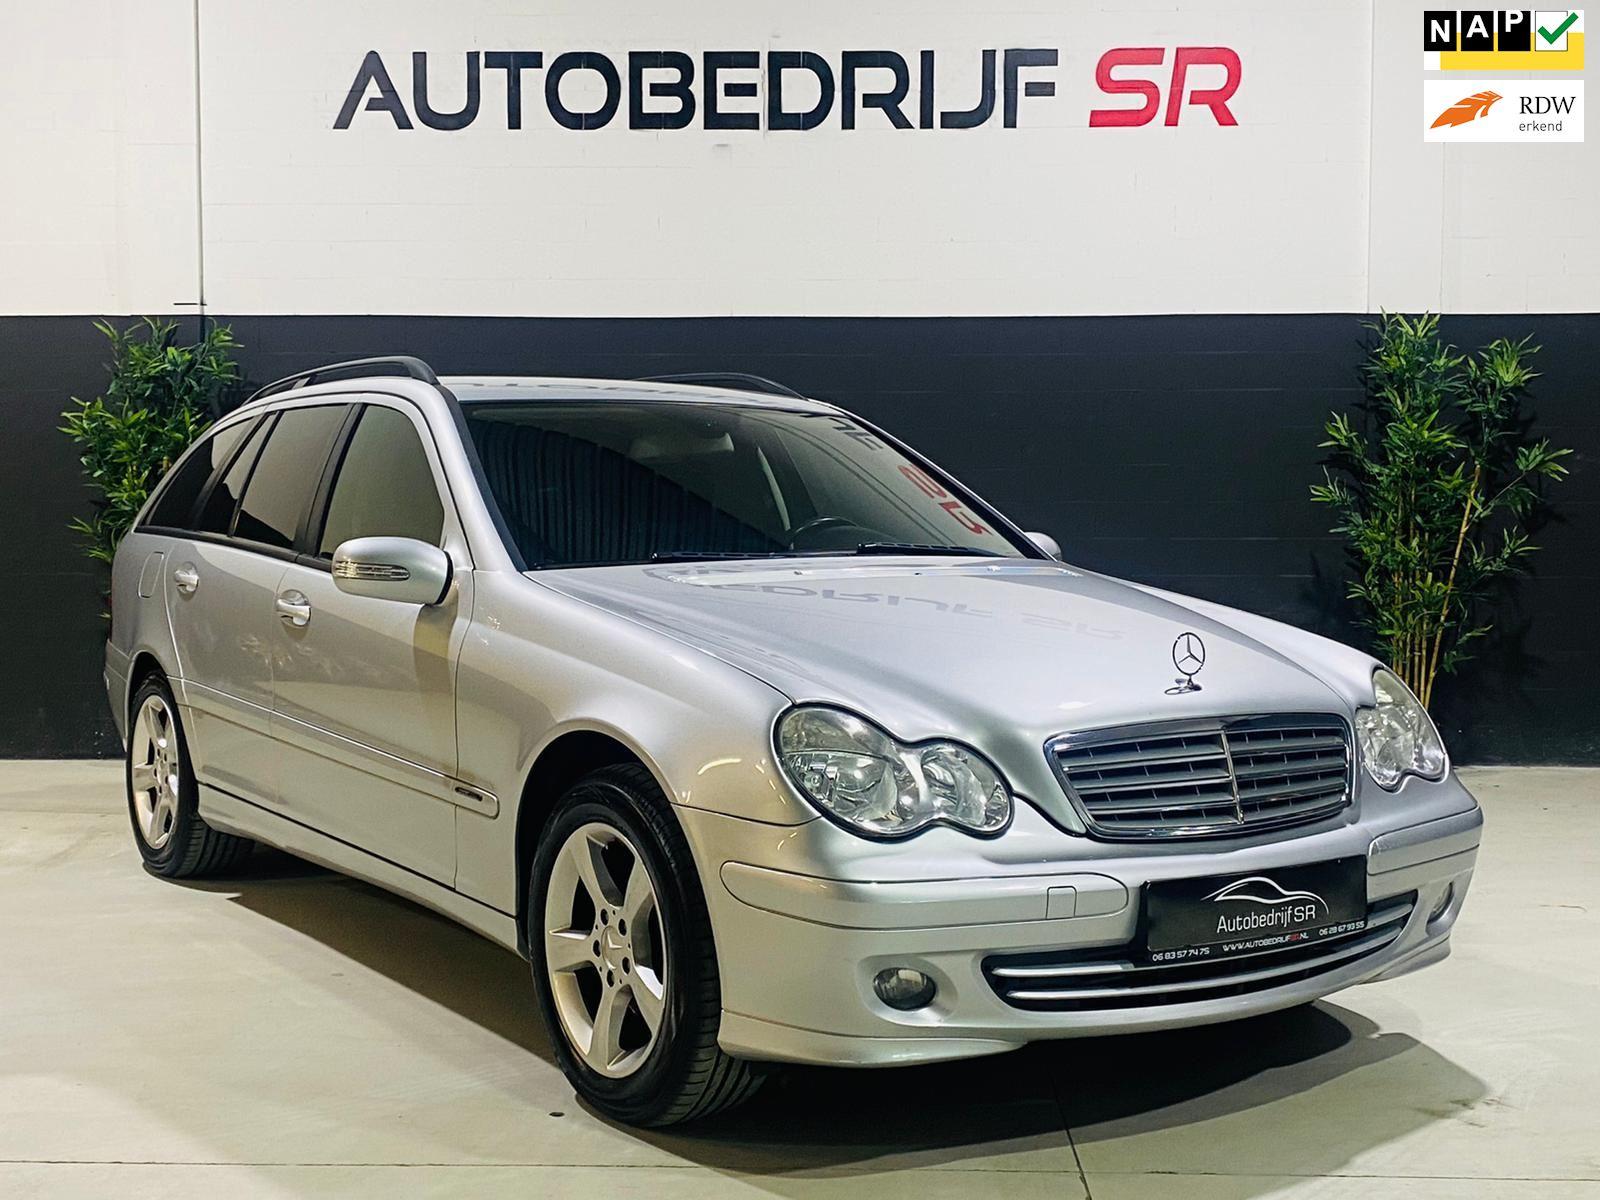 Mercedes-Benz C-klasse Combi occasion - Autobedrijf SR